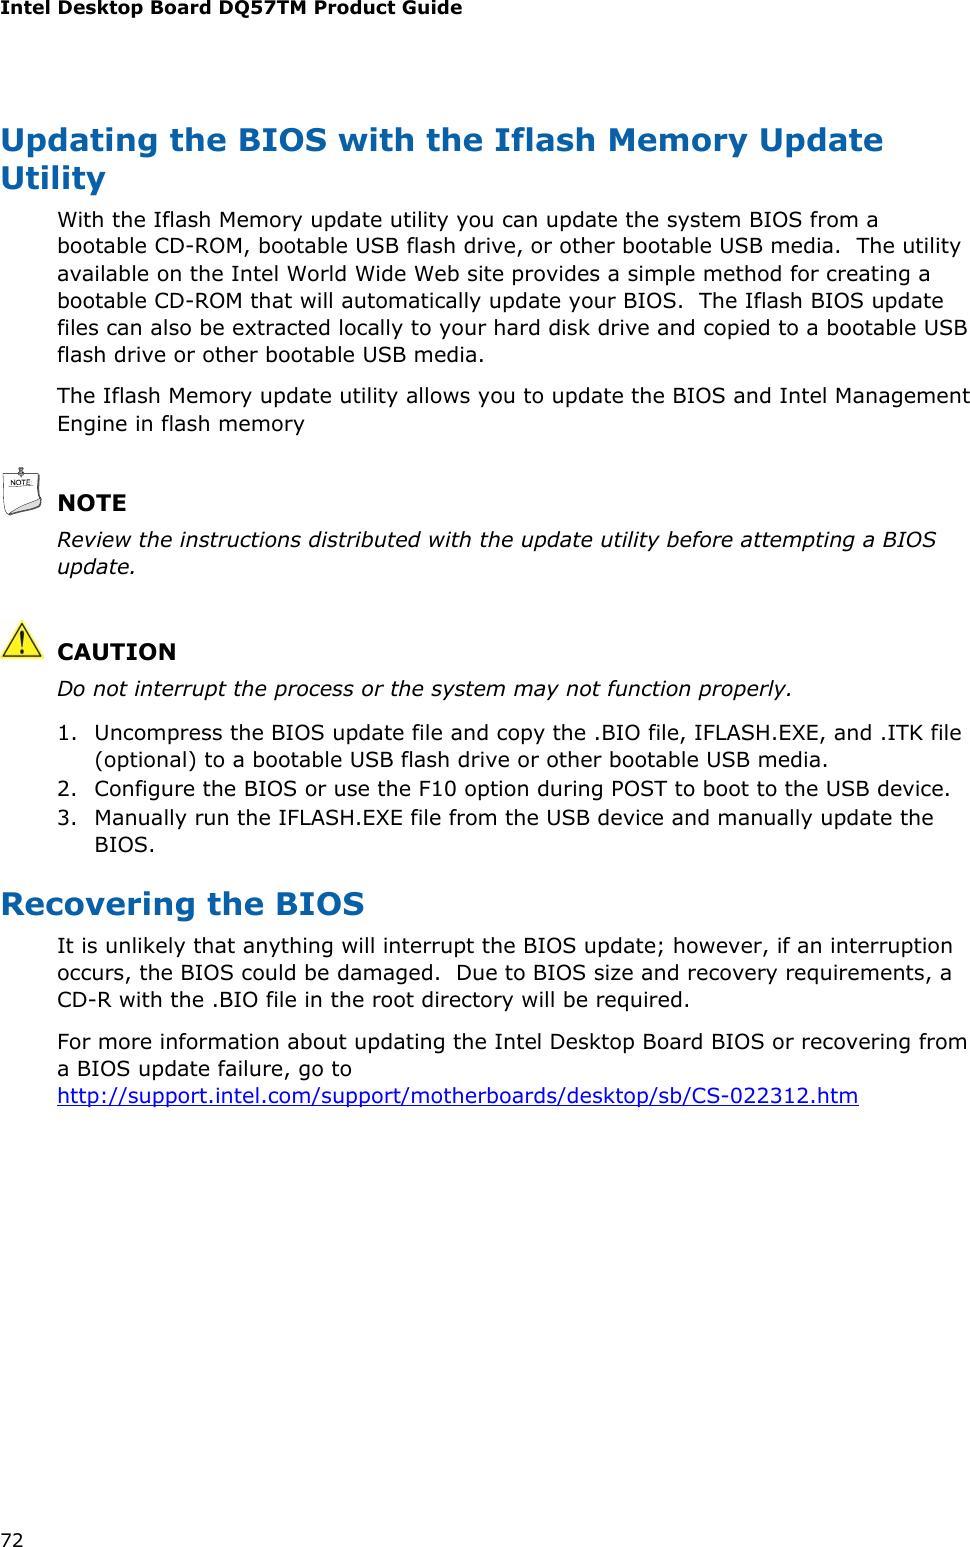 Intel Dq57Tm Users Manual Intel® Desktop Board Product Guide